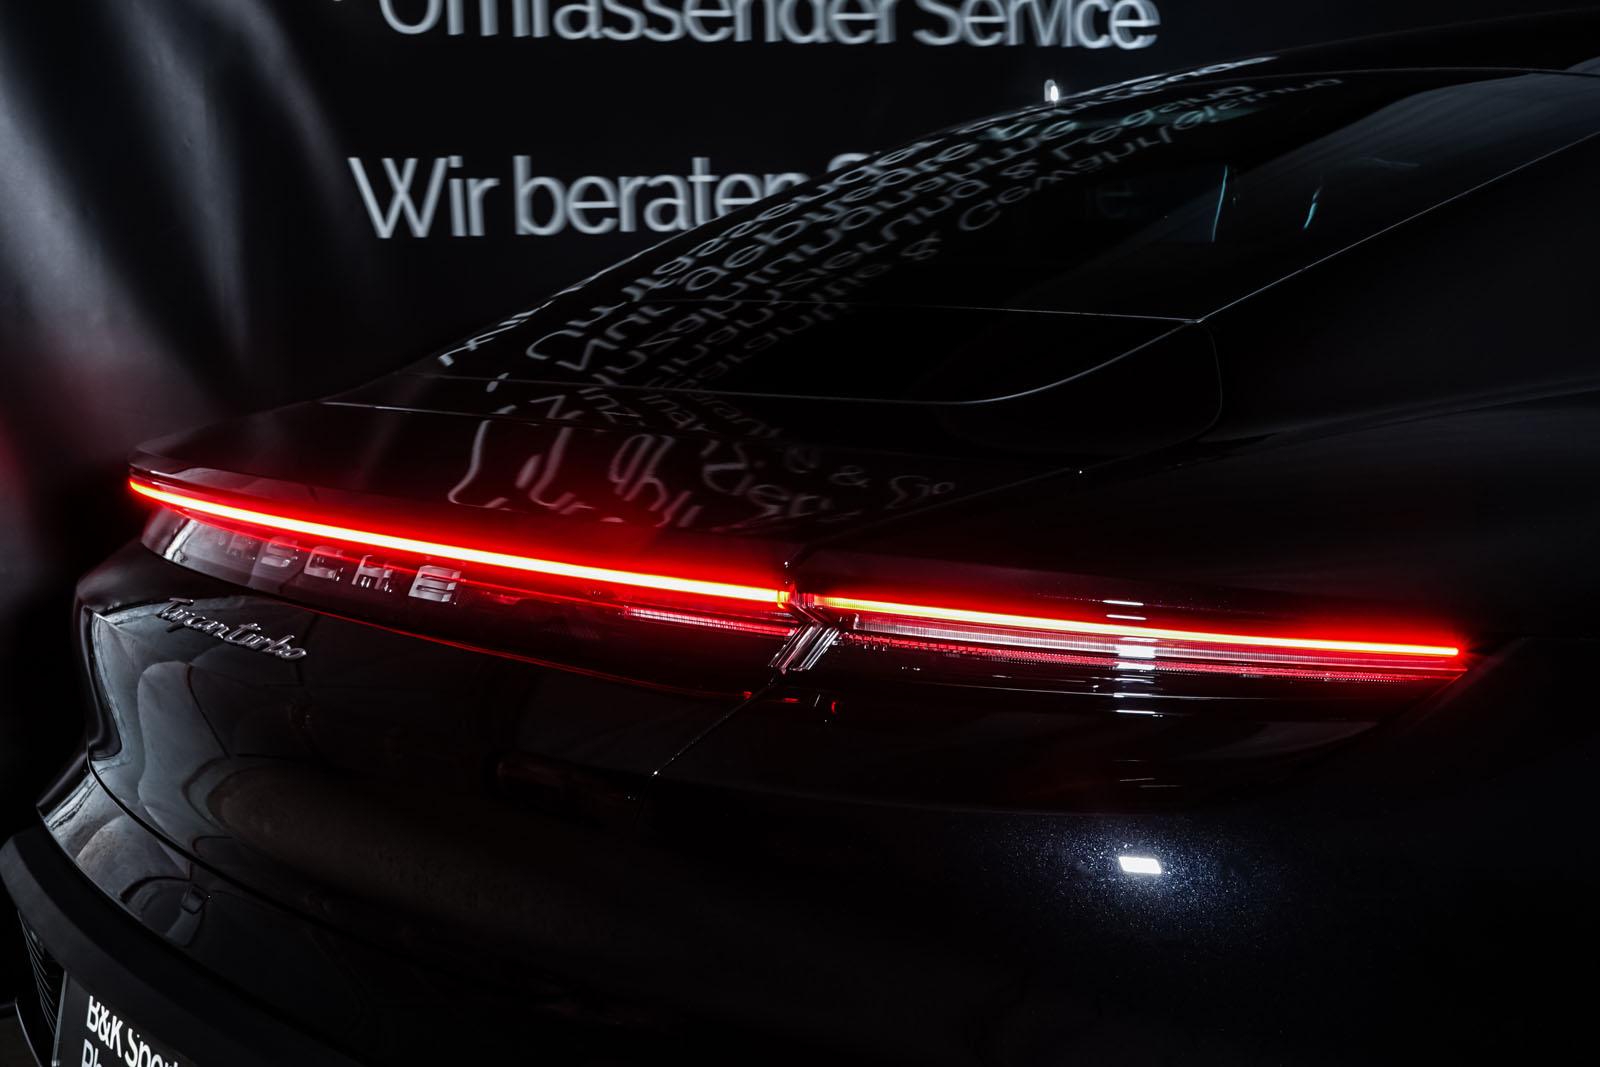 Porsche_Taycan_Turbo_Schwarz_Schwarz_POR-8106_23_w